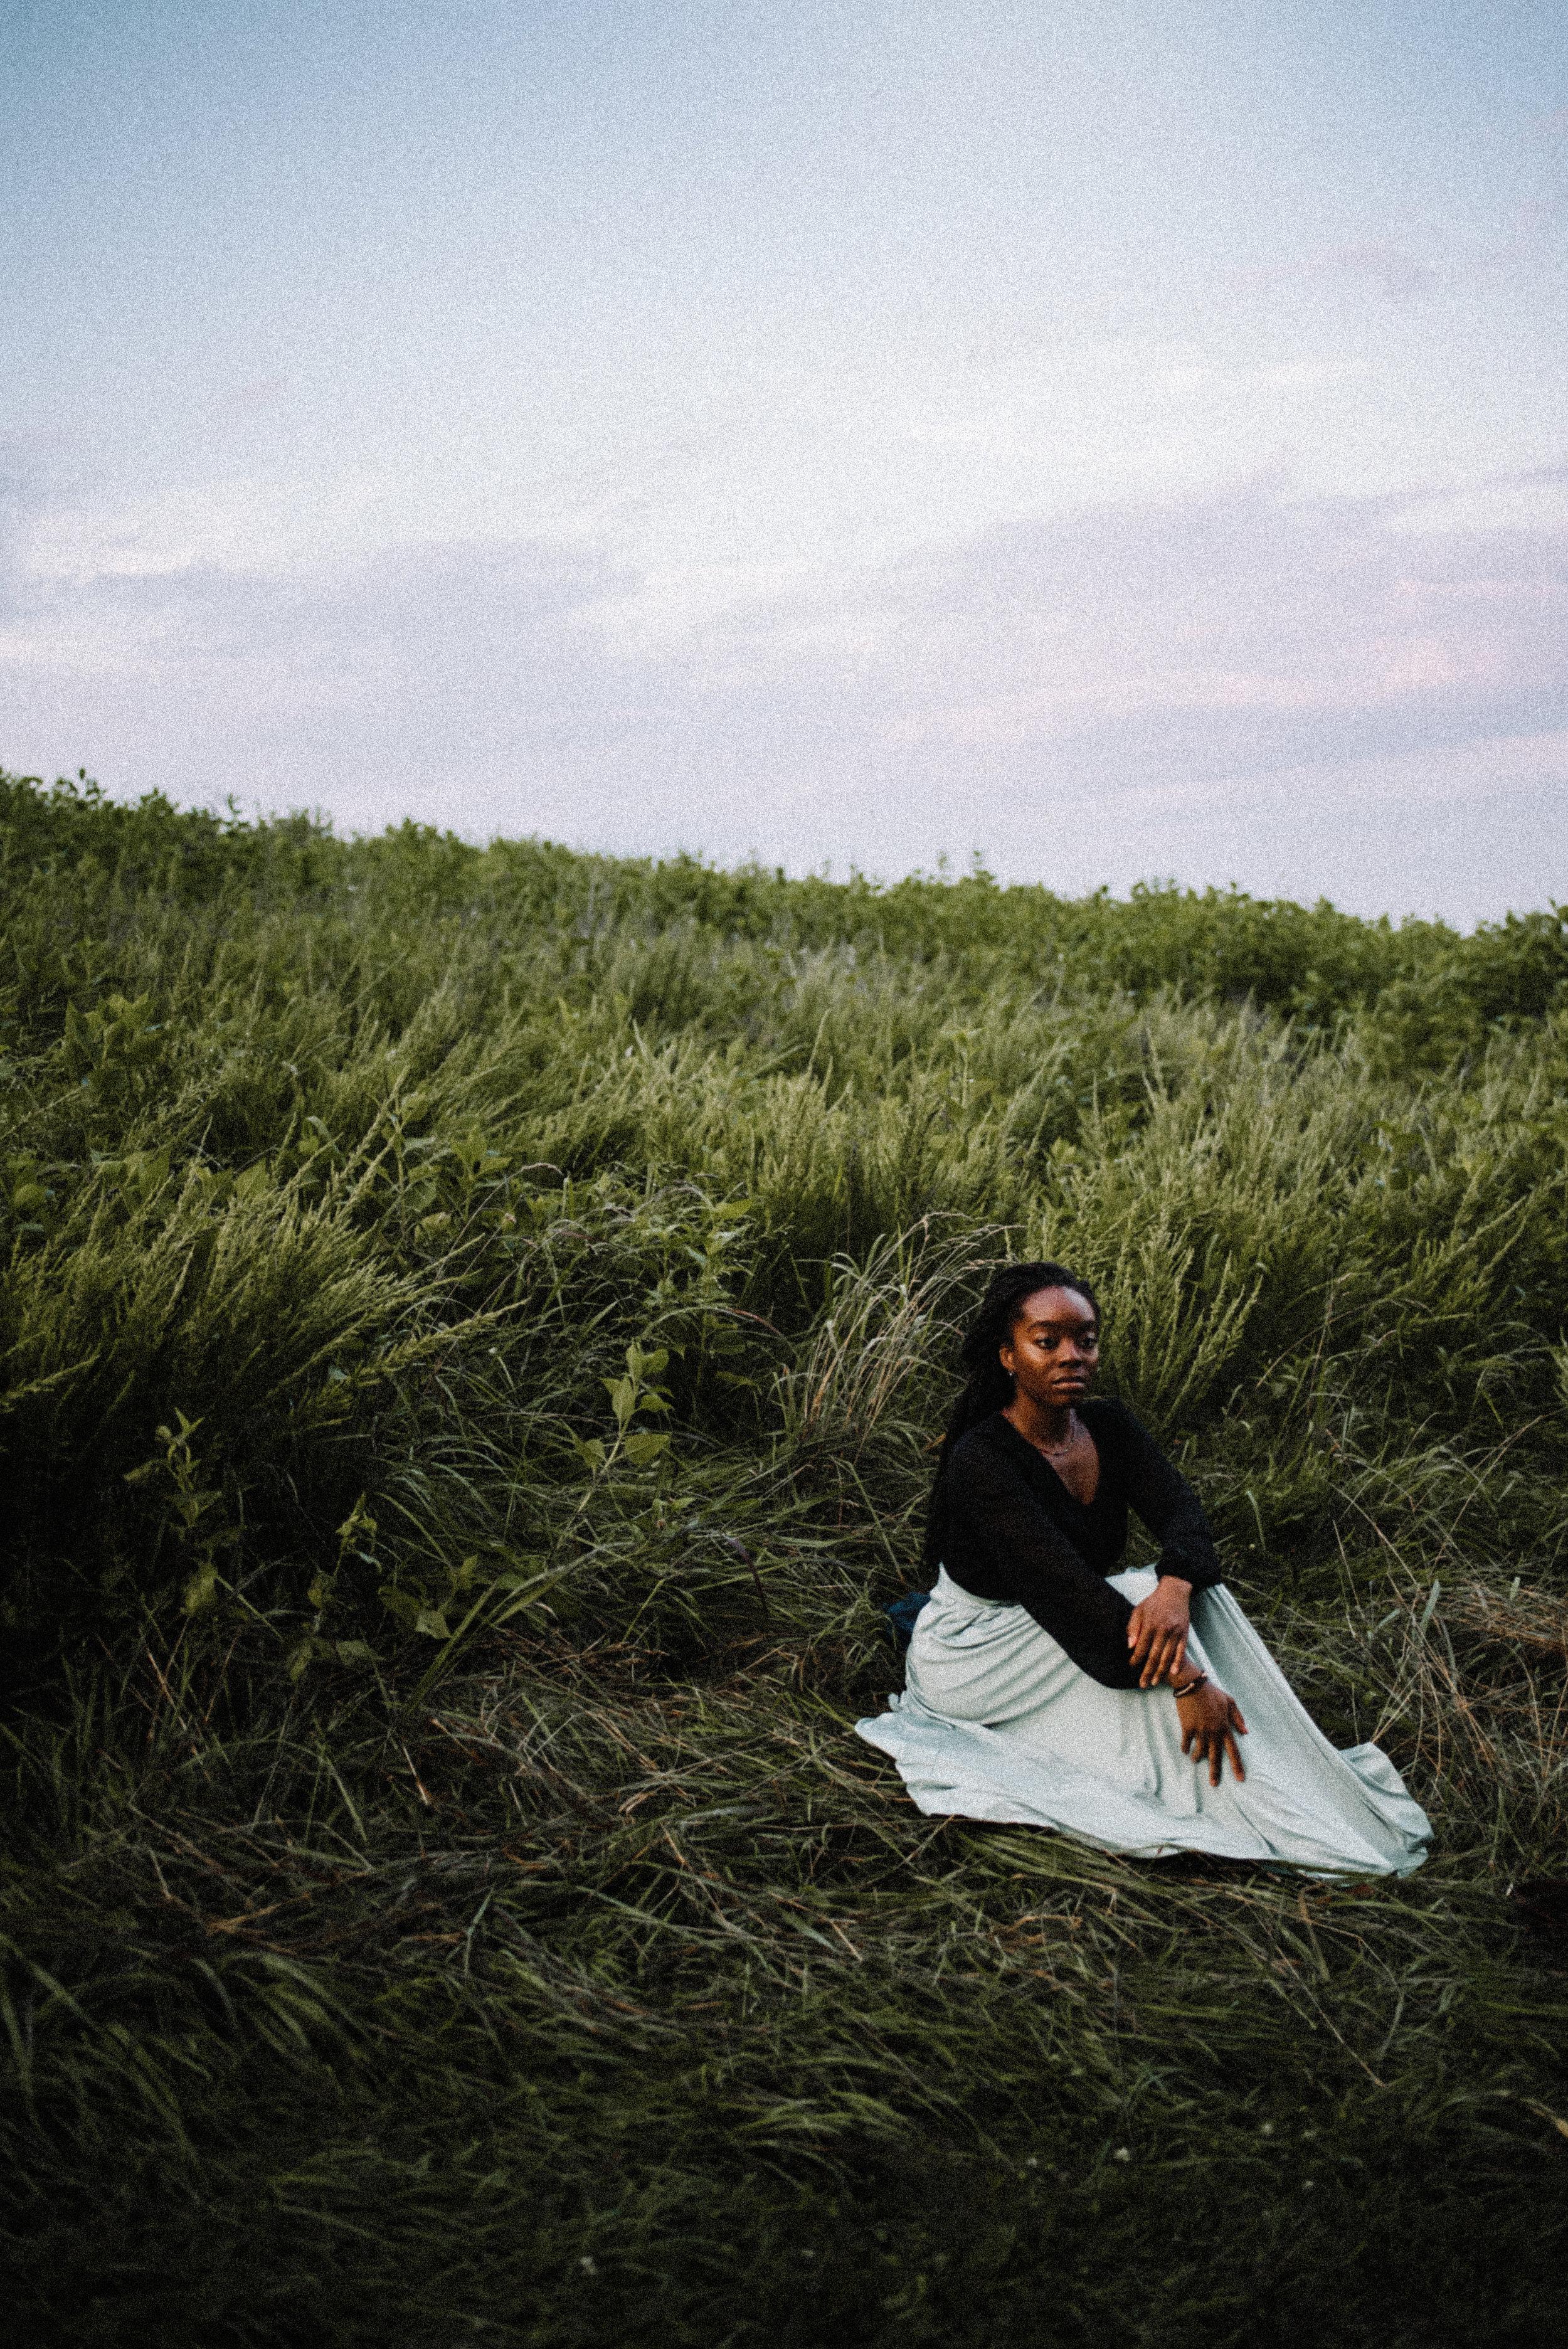 Mercy - White Sails Photography - adventure portraits - sky meadows state park 9.JPG